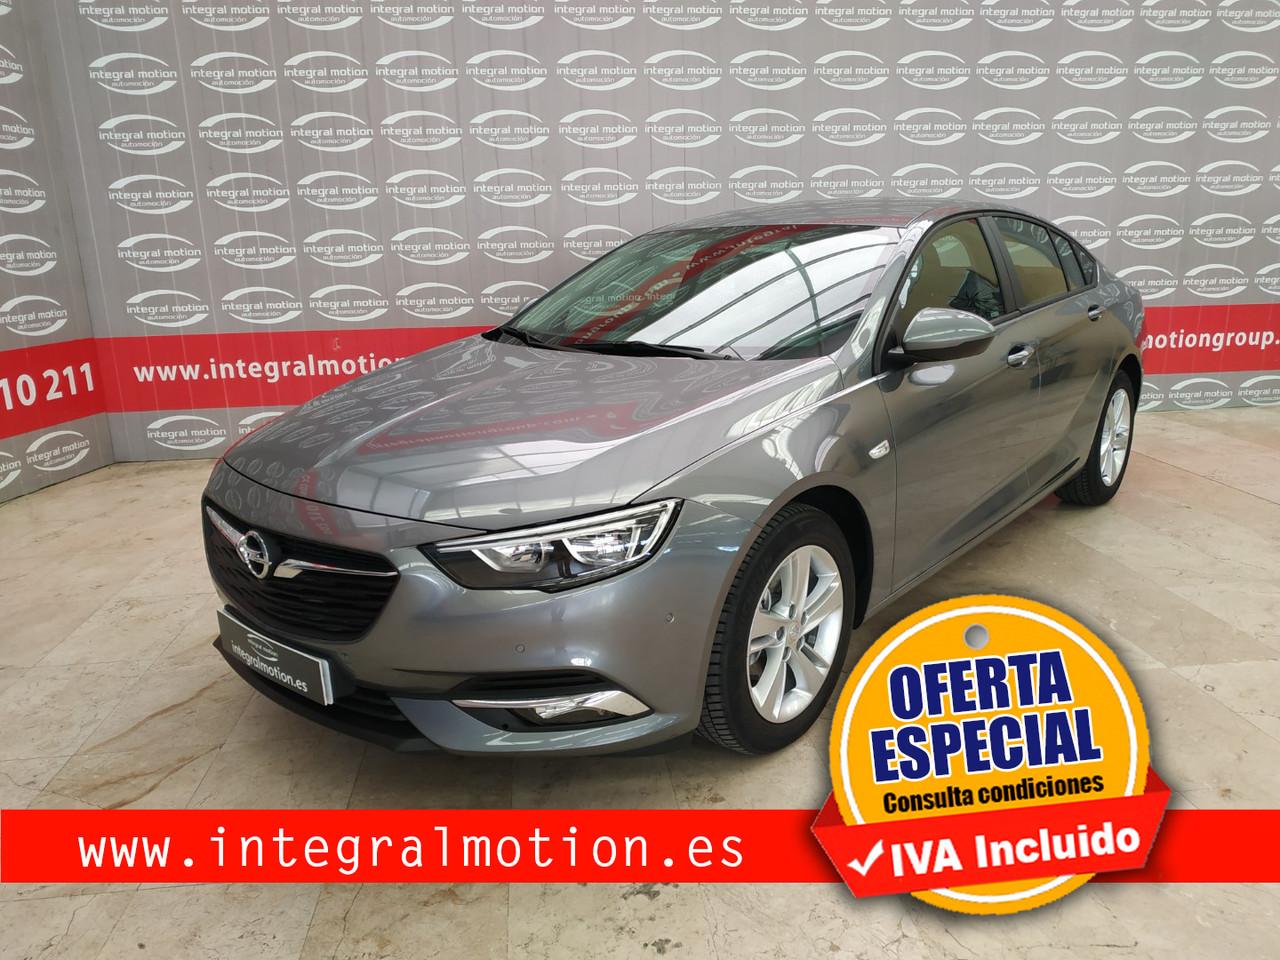 Opel Insignia GS 1.6 CDTi 100kW Turbo D Selective  - Foto 1